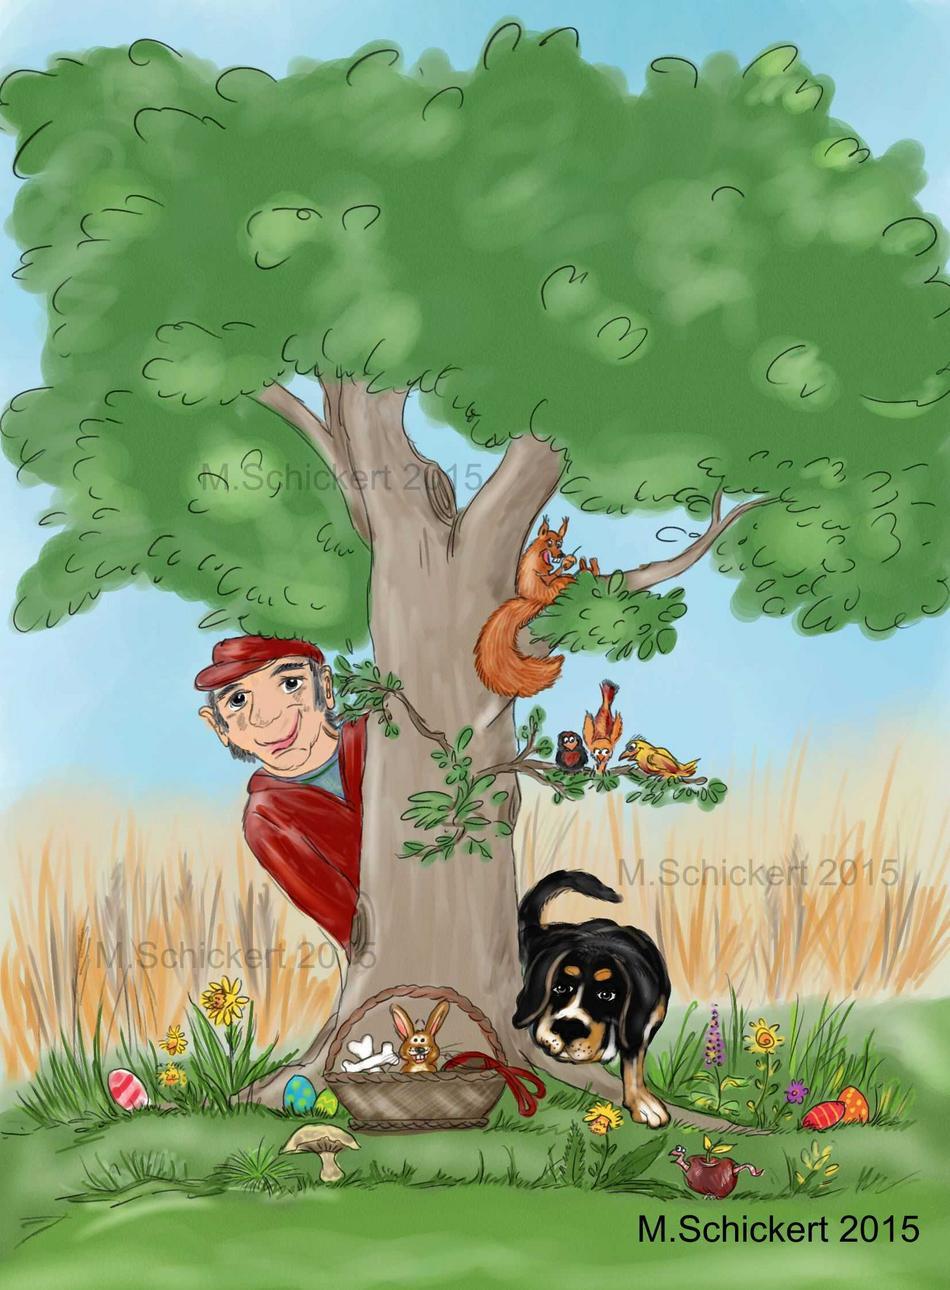 Kinderbuchillustrationen Ostern, Hundegeschichte